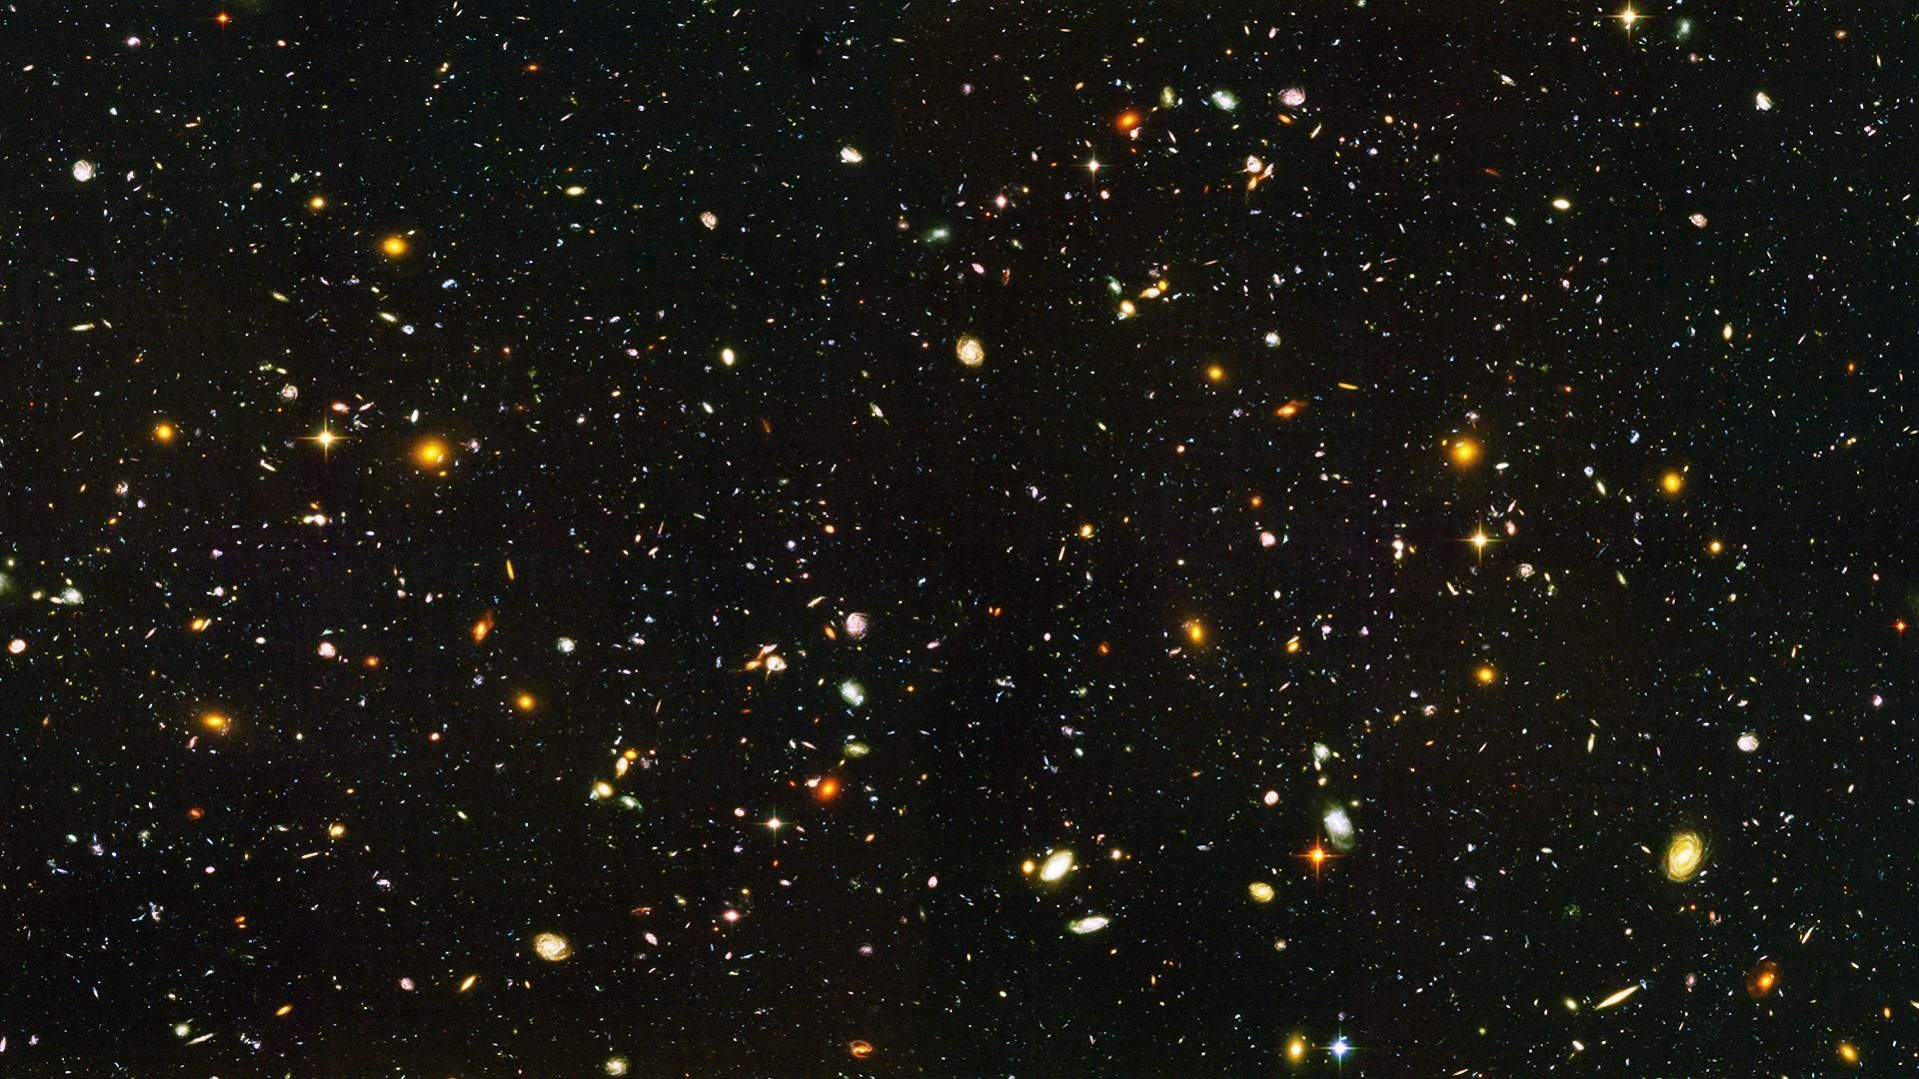 Hubble Ultra Deep Field Wallpaper 1600x900 Pics About Space Hubble Ultra Deep Field Hubble Deep Field Hubble